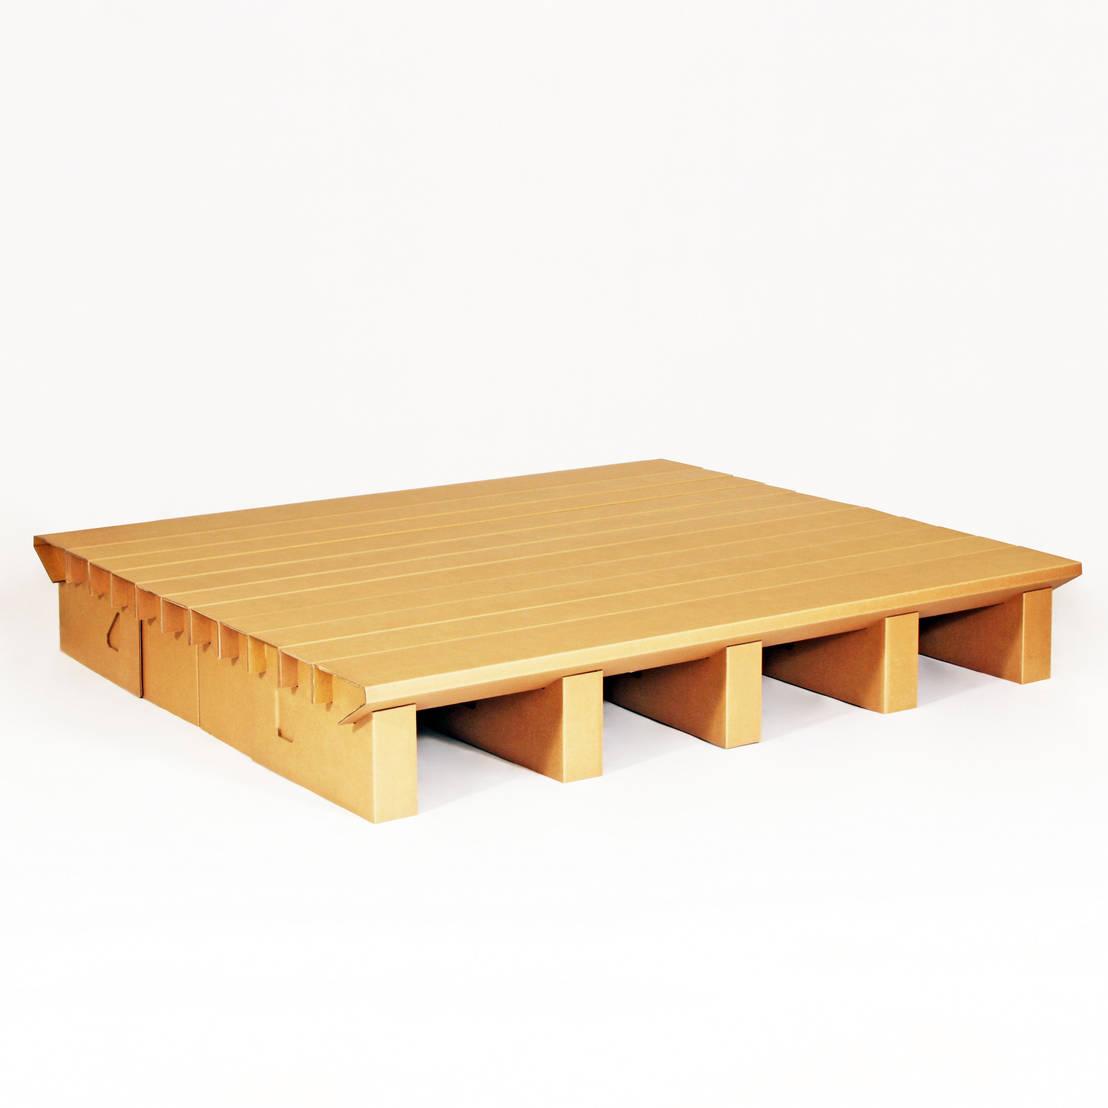 bett dream de stange design homify. Black Bedroom Furniture Sets. Home Design Ideas